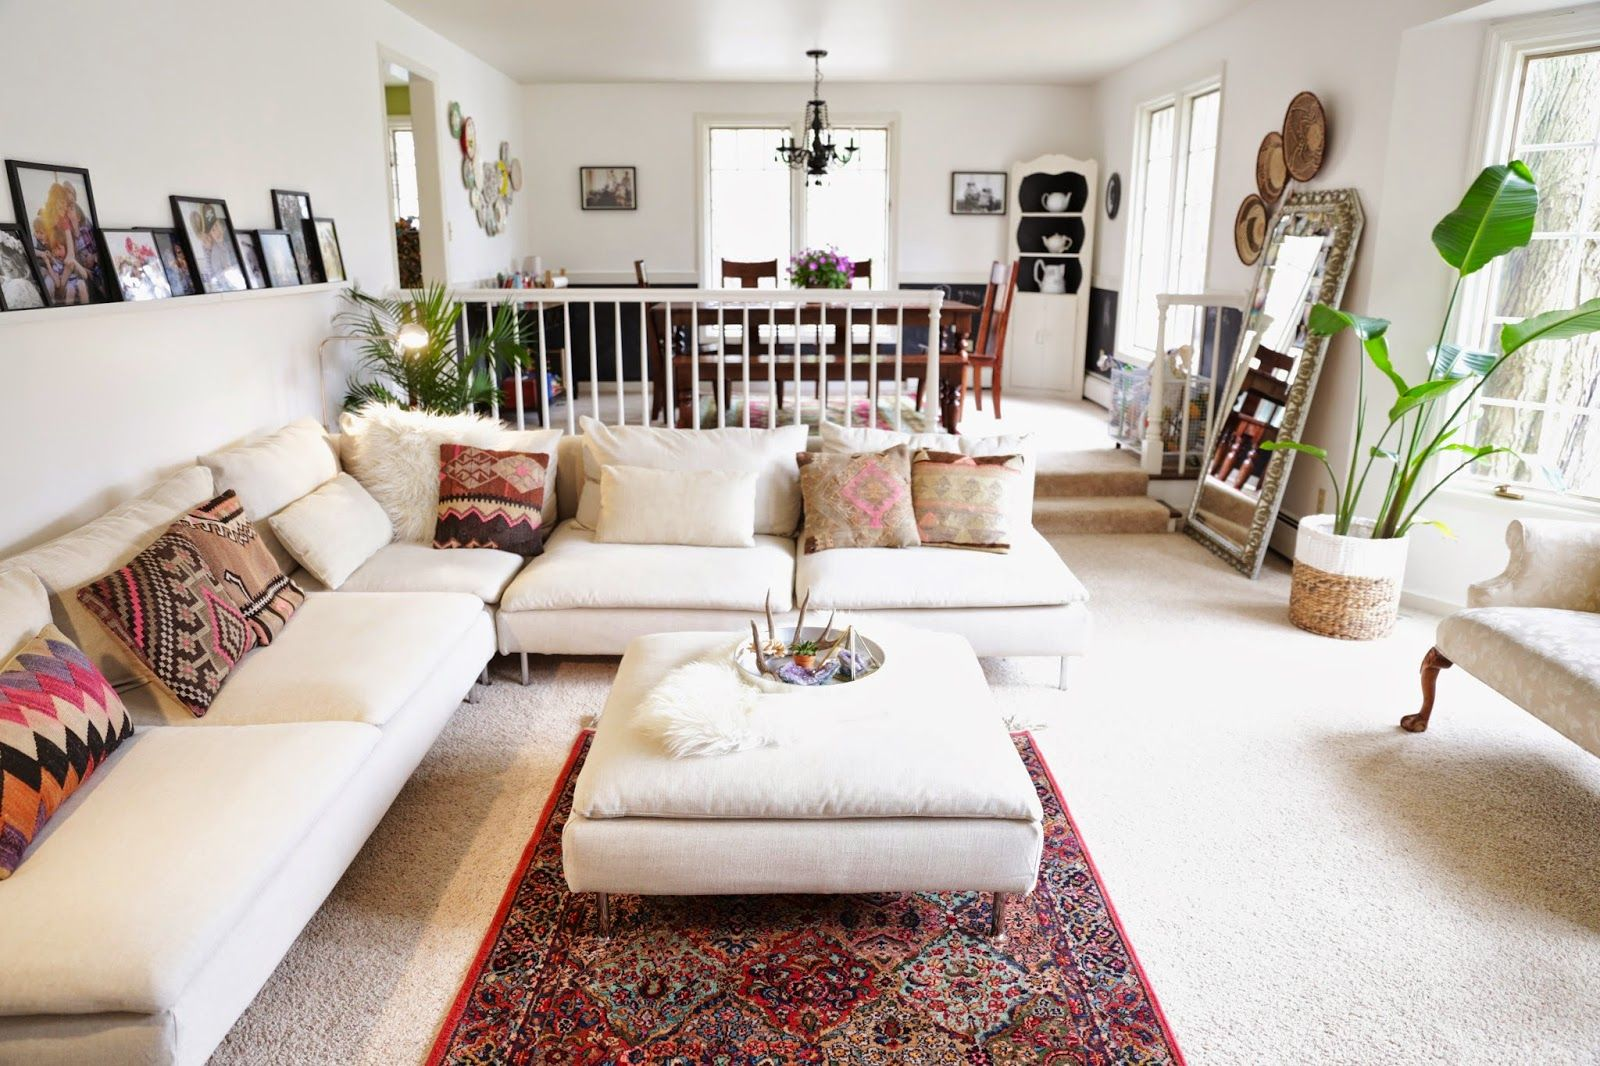 IKEA Soderhamn sofa review Ikea living room, Living room